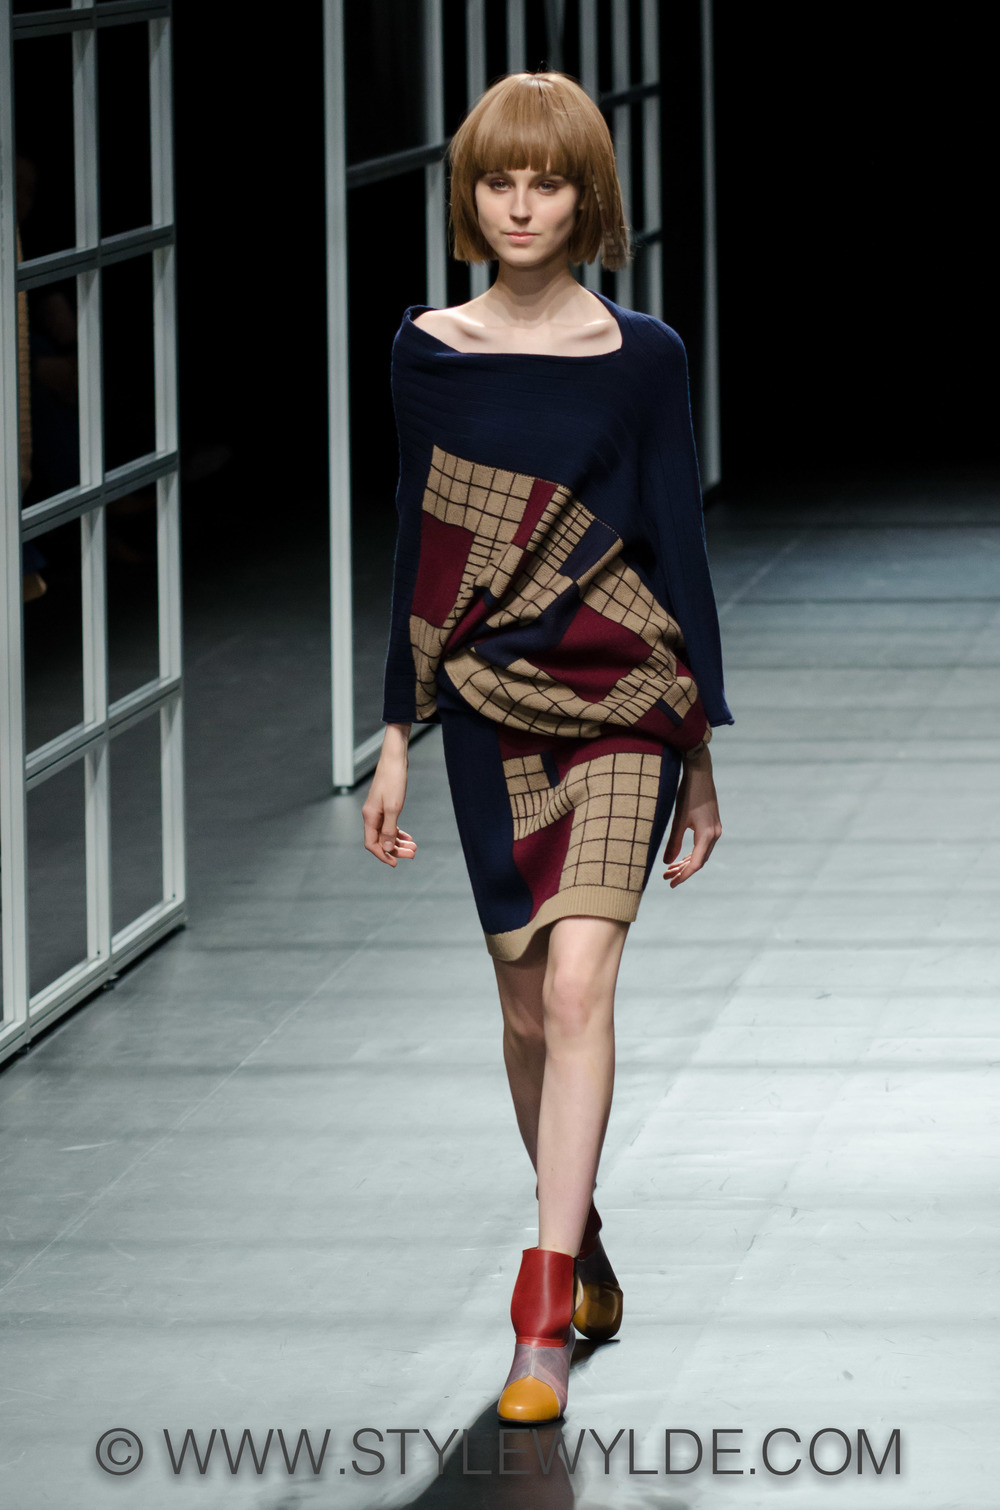 StyleWylde_YasutoshiEzumi_AW14_story (1 of 1)-11.jpg